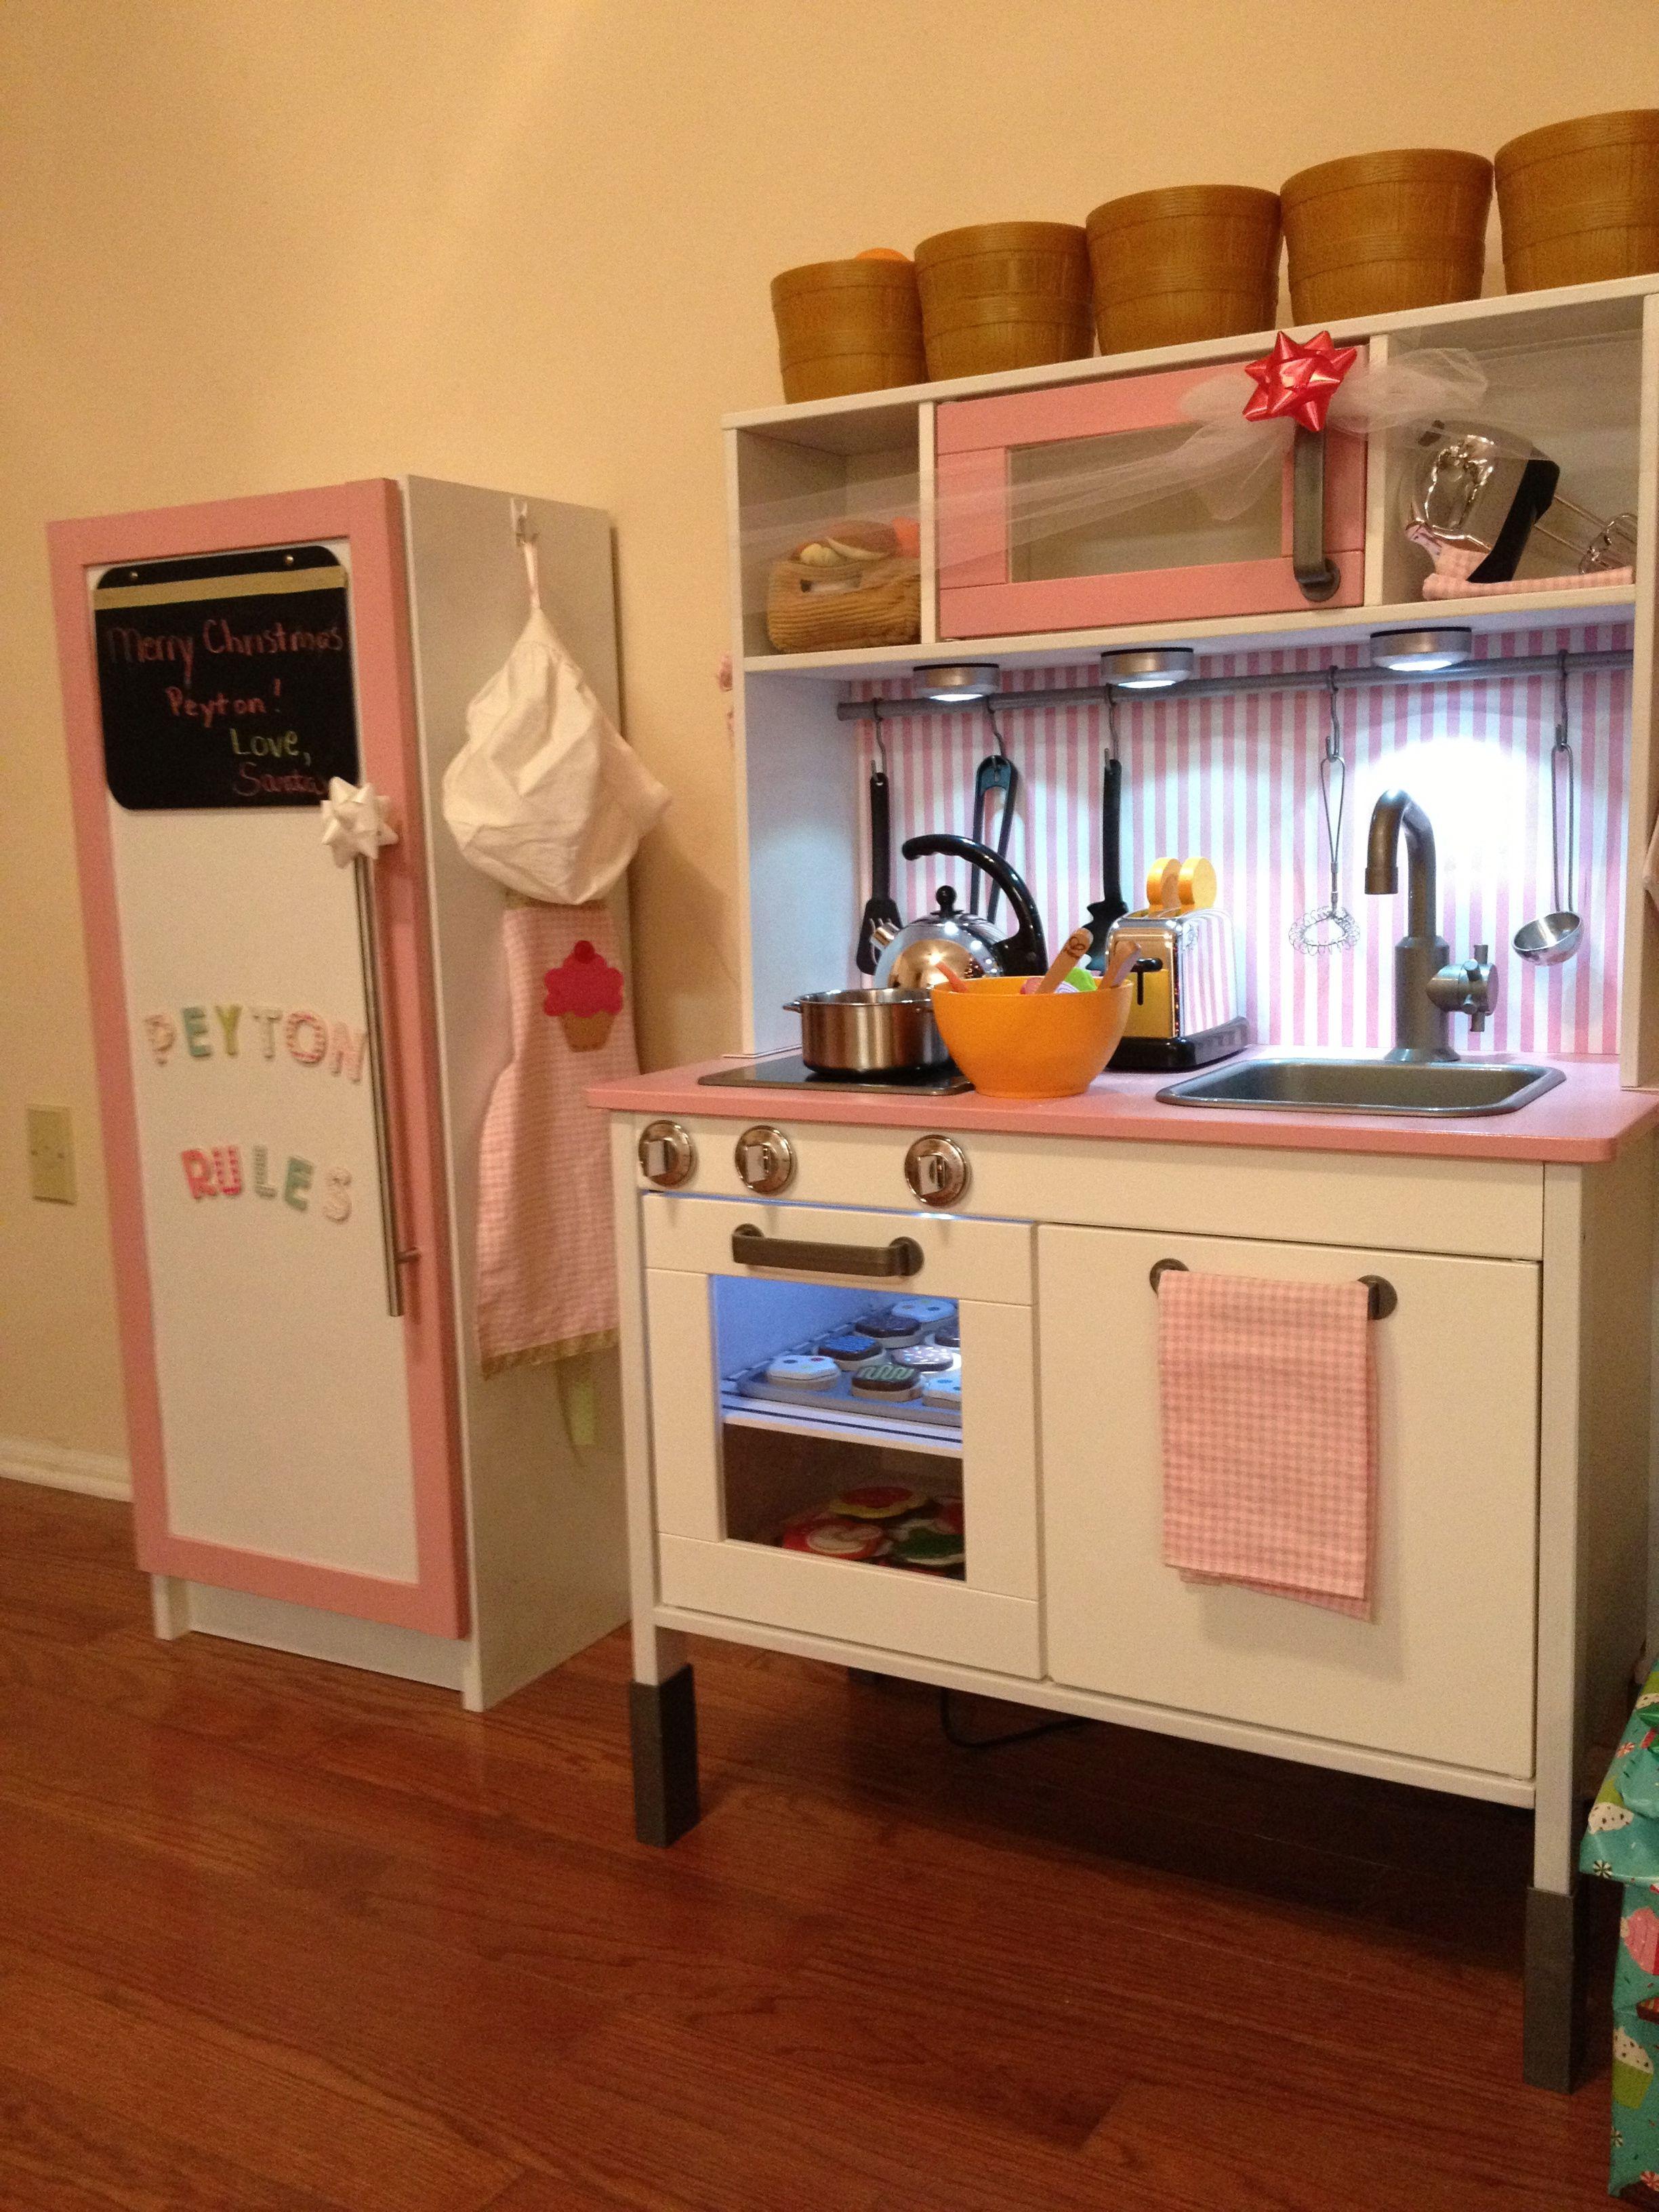 The 5 Best Diy Play Kitchens Gruppenraumgestaltung Kita